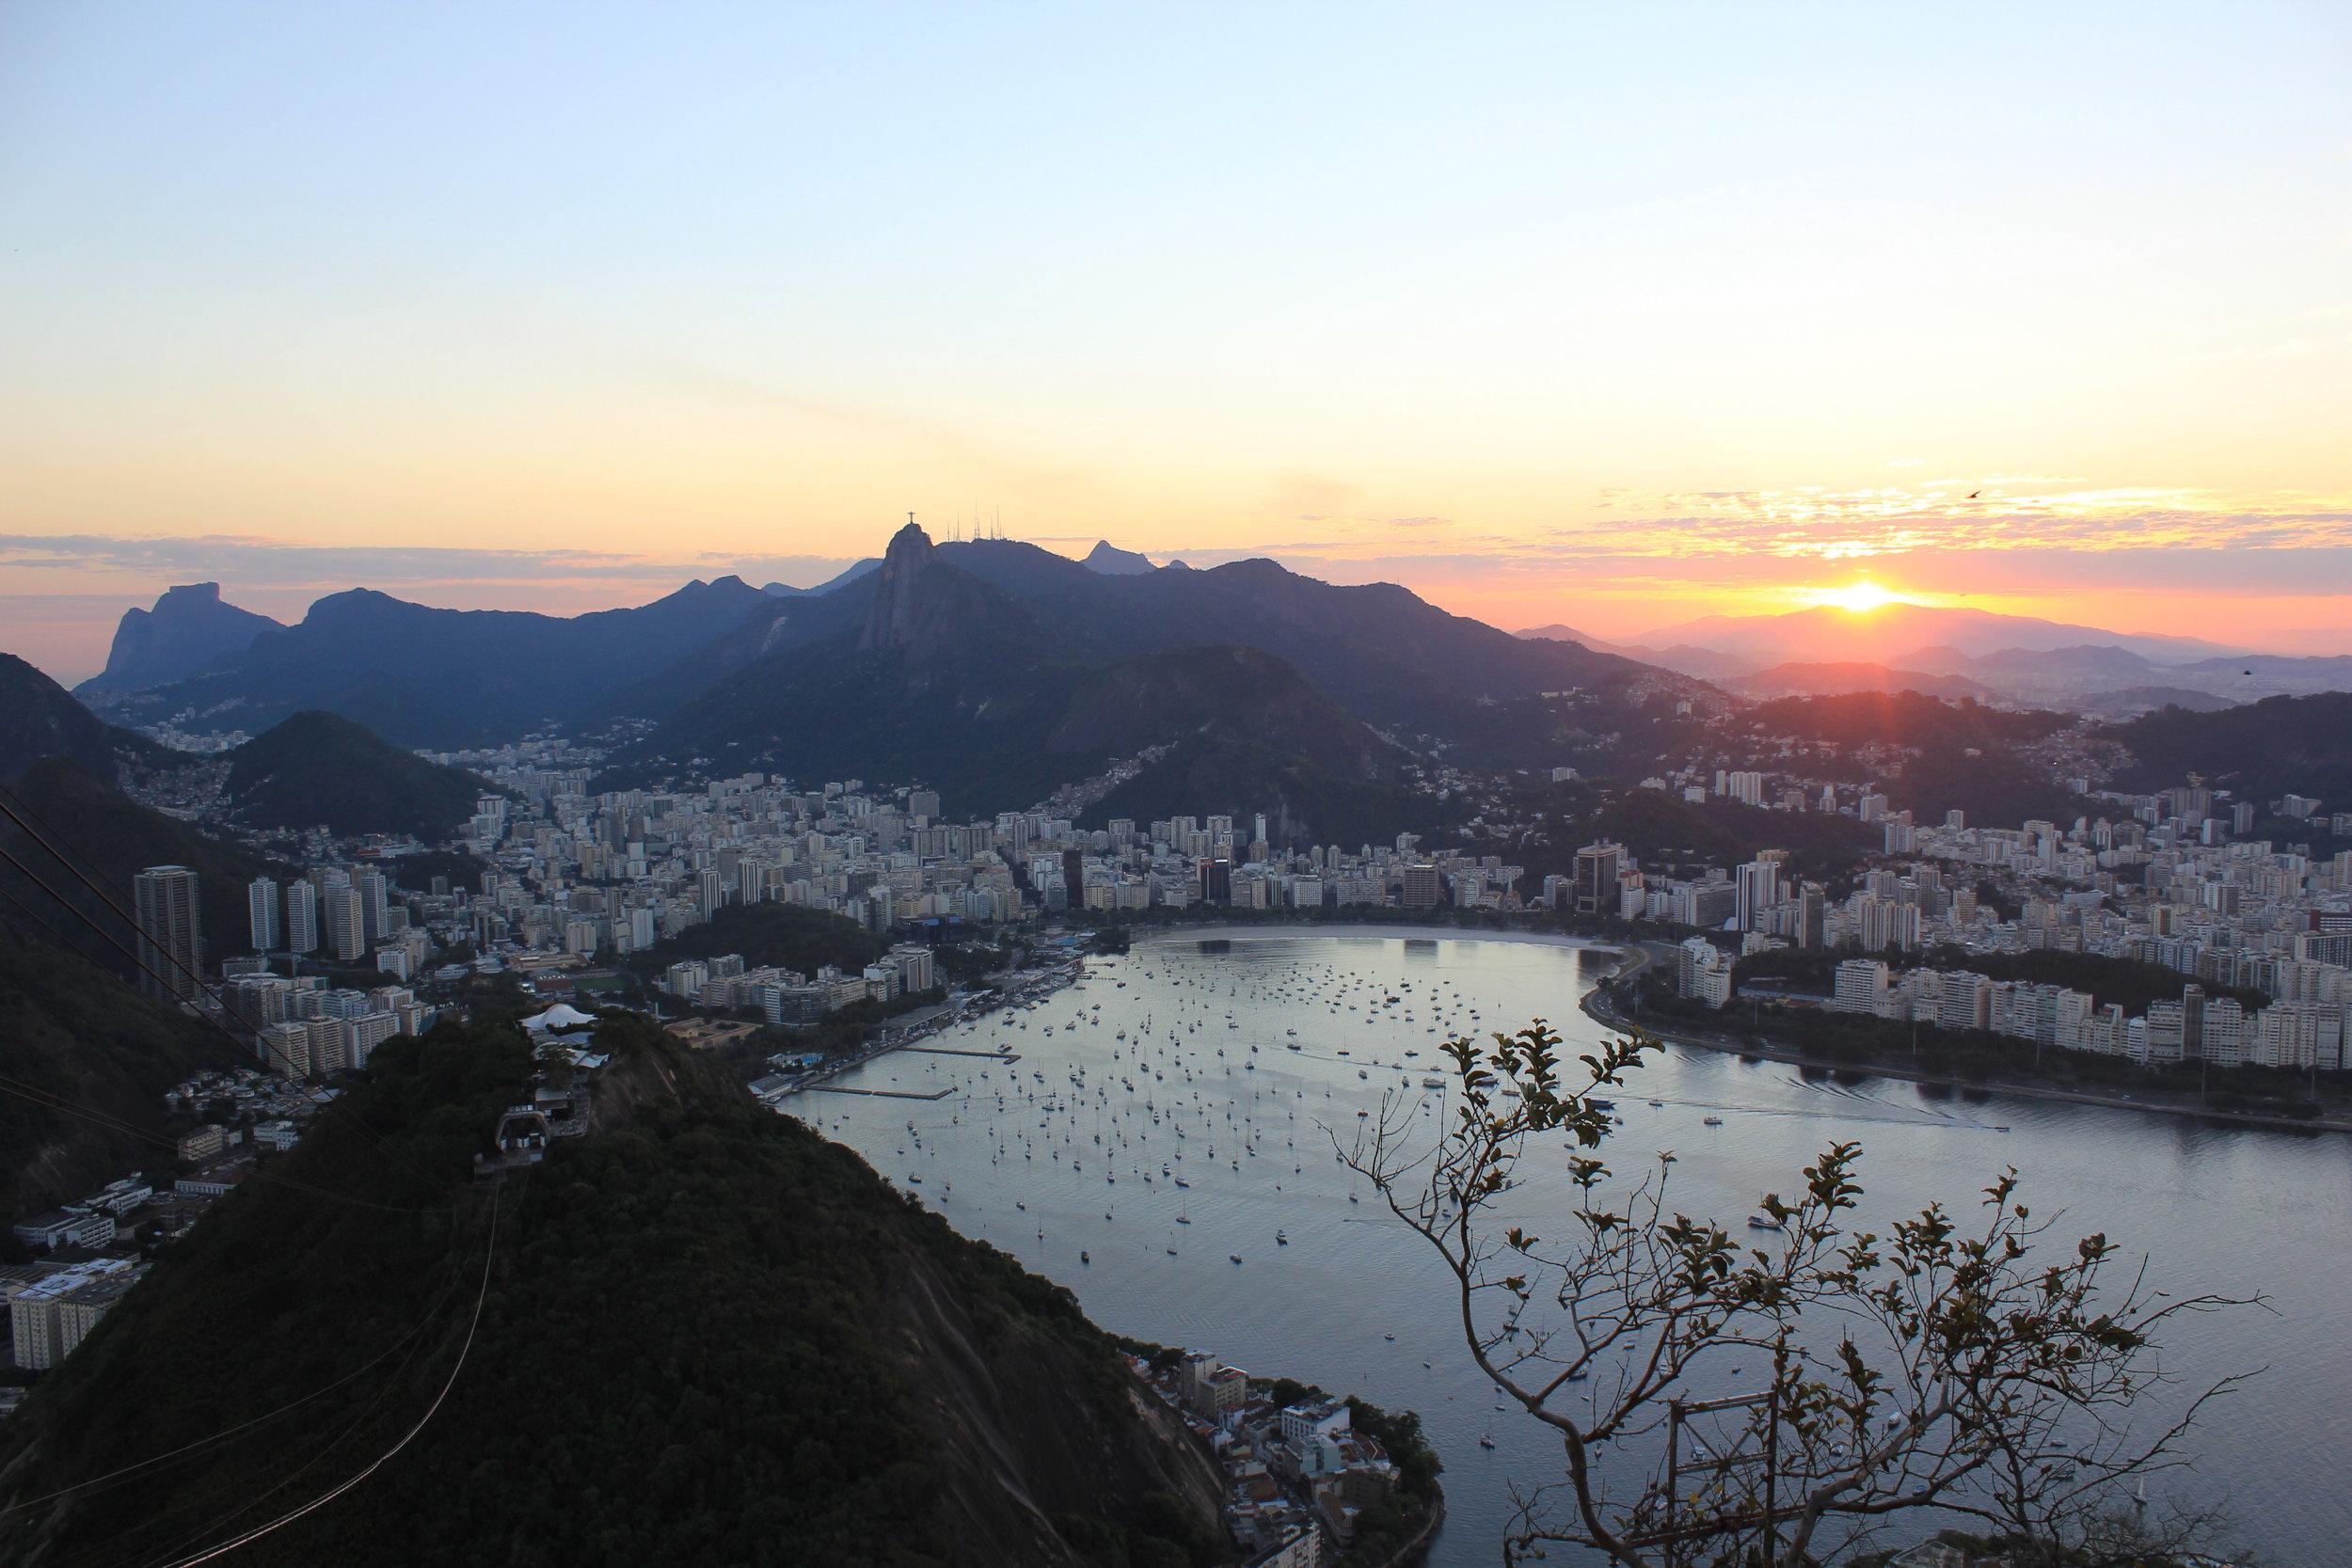 Rio de Janeiro, Brazil – Sunset view from Sugarloaf Mountain